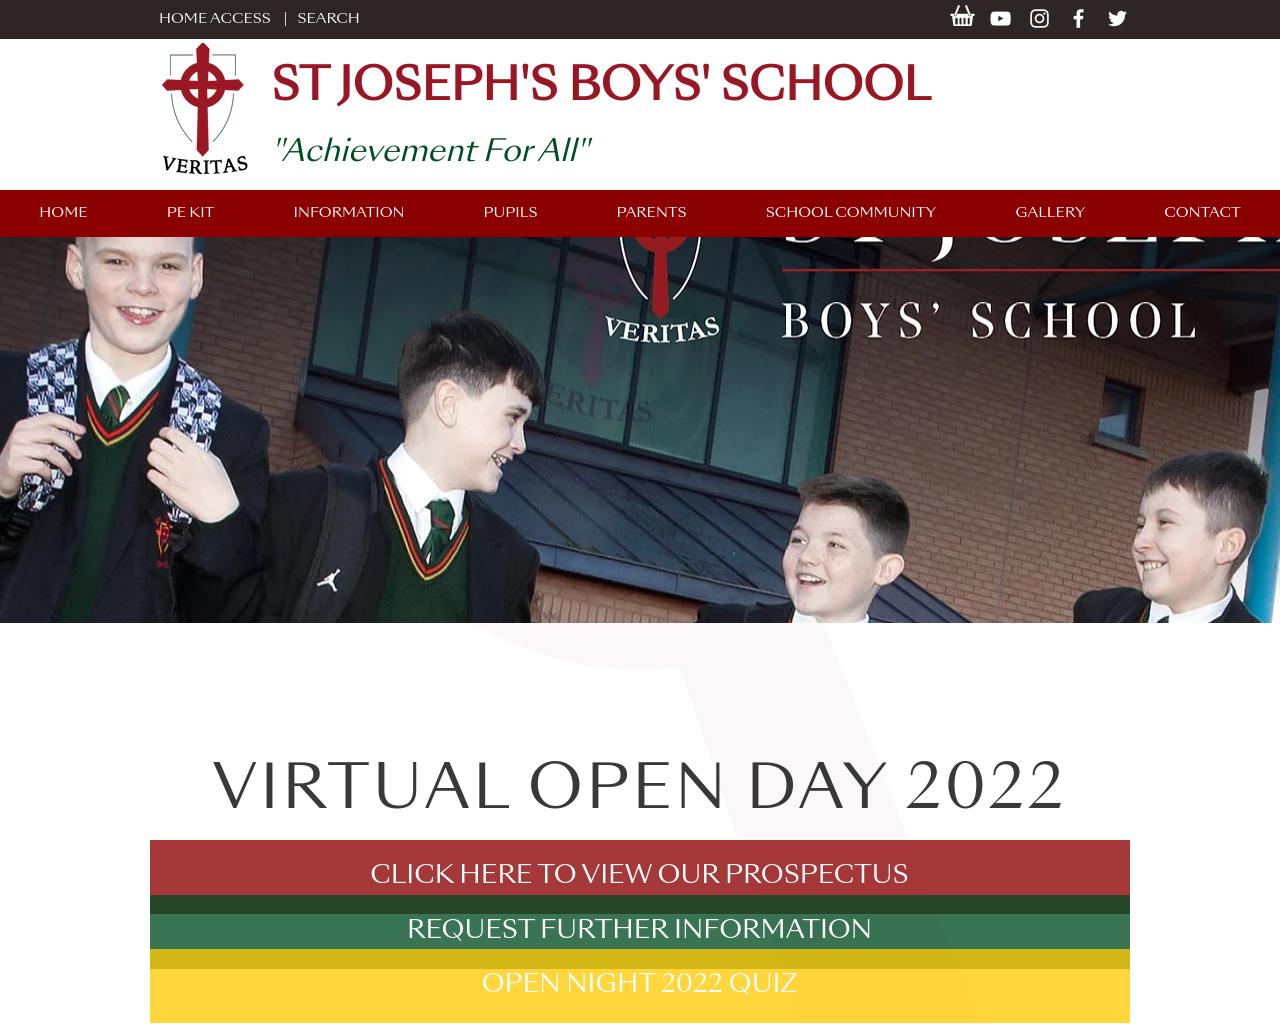 St. Joseph's Prospectus 2021